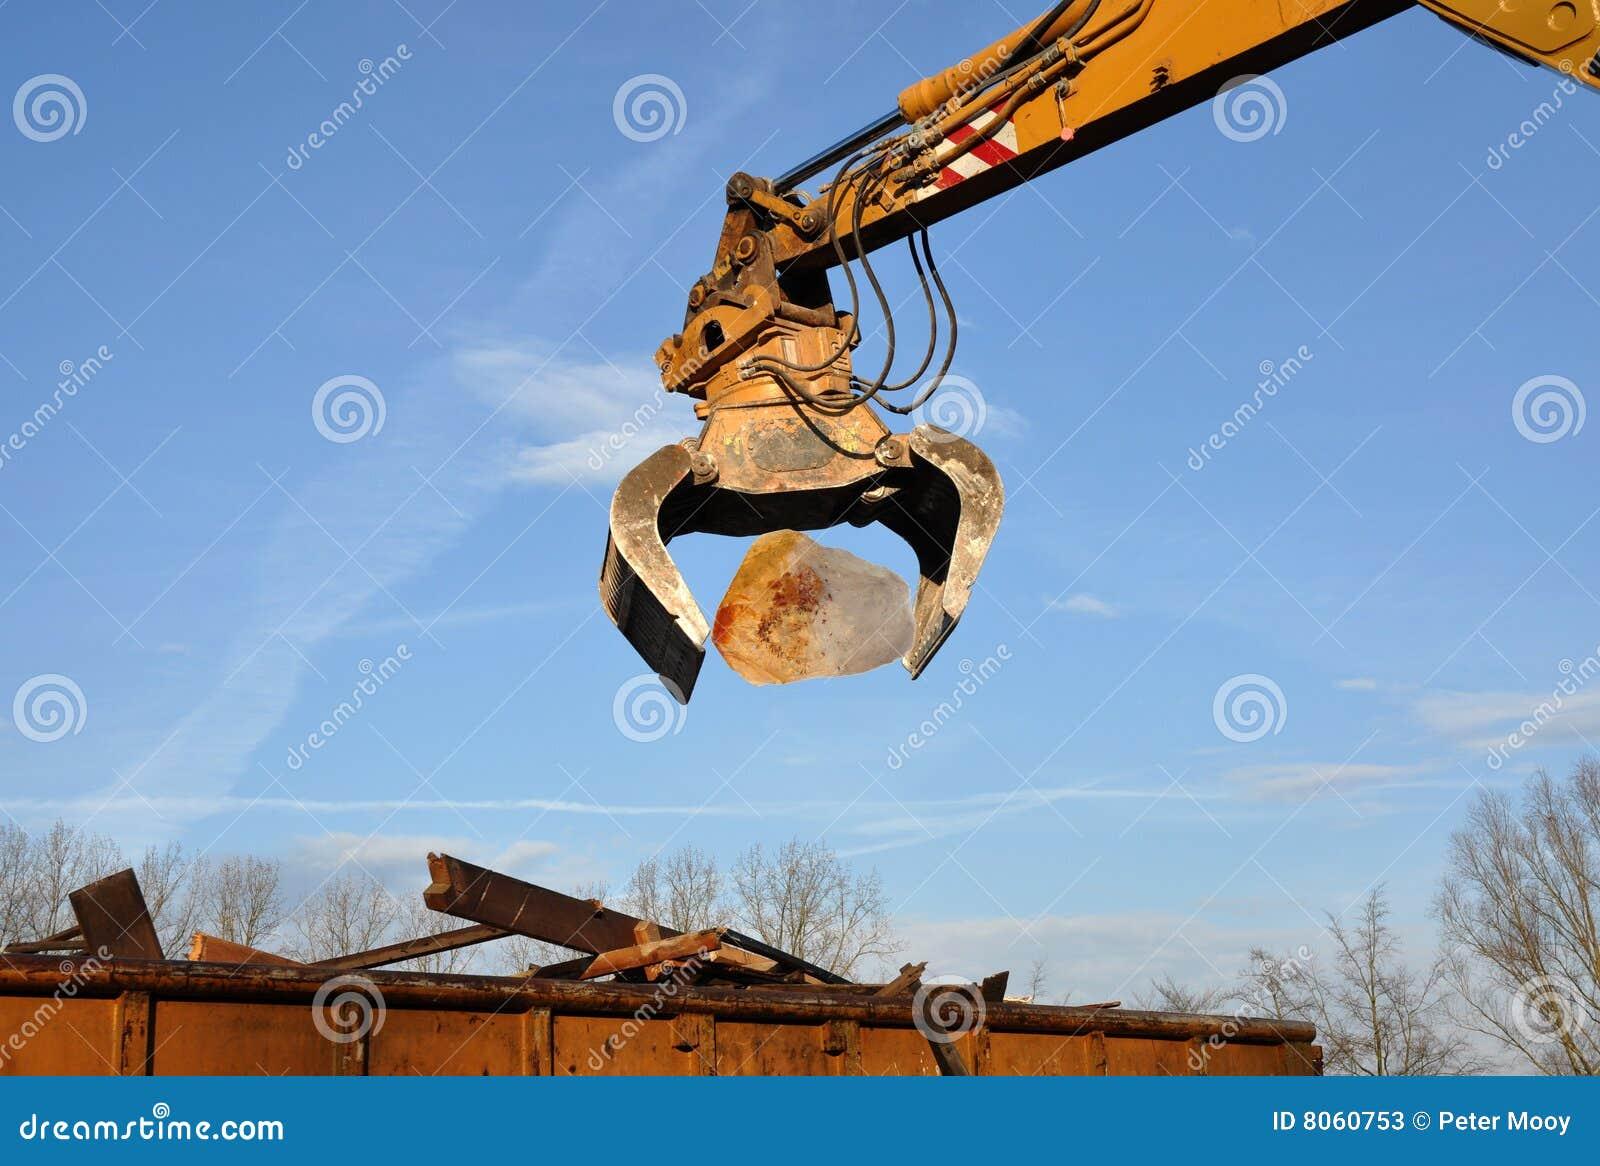 Demolition craneDemolition Crane